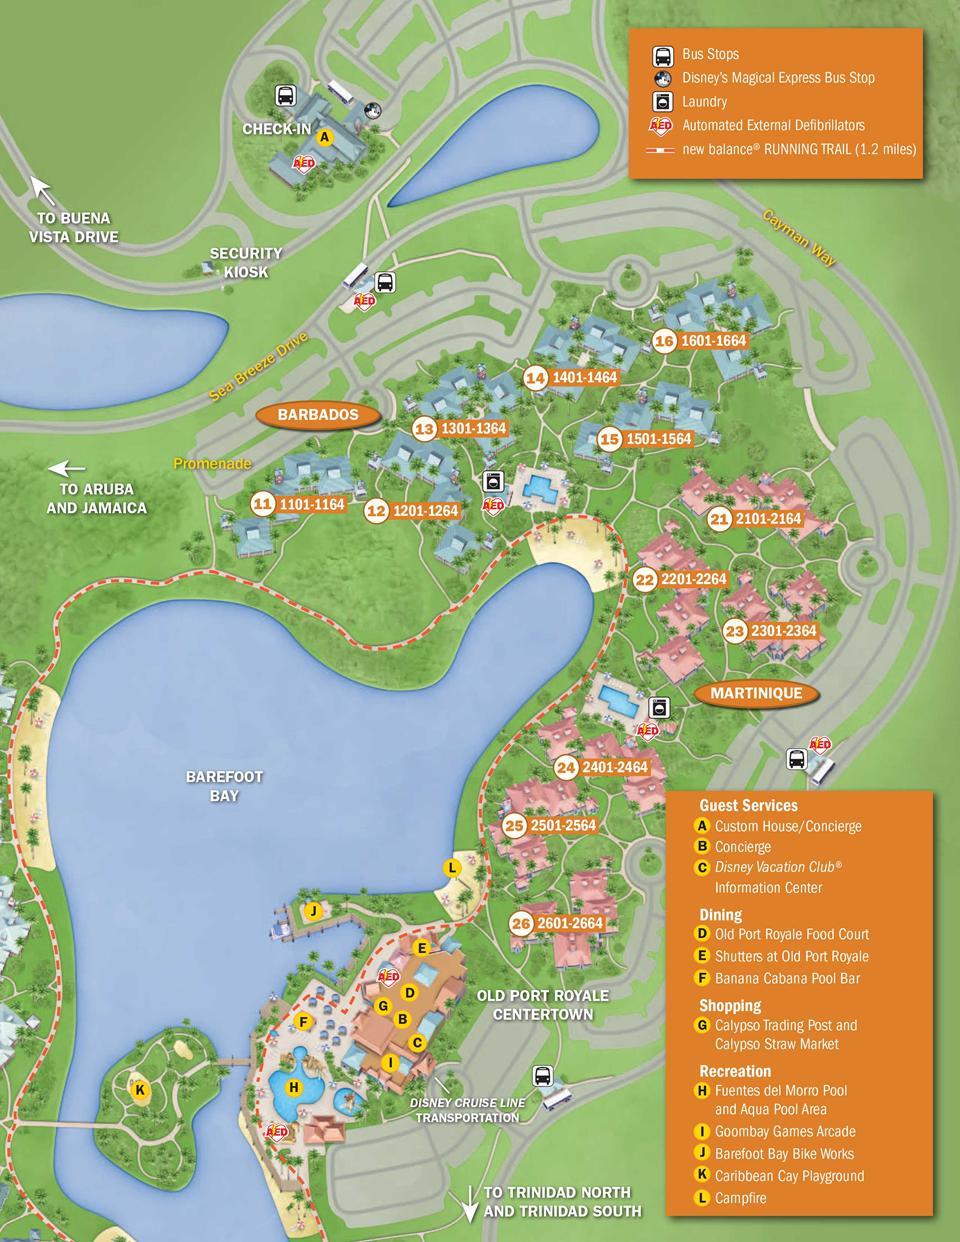 disney's caribbean beach resort map  barbados. april  walt disney world resort hotel maps  photo  of